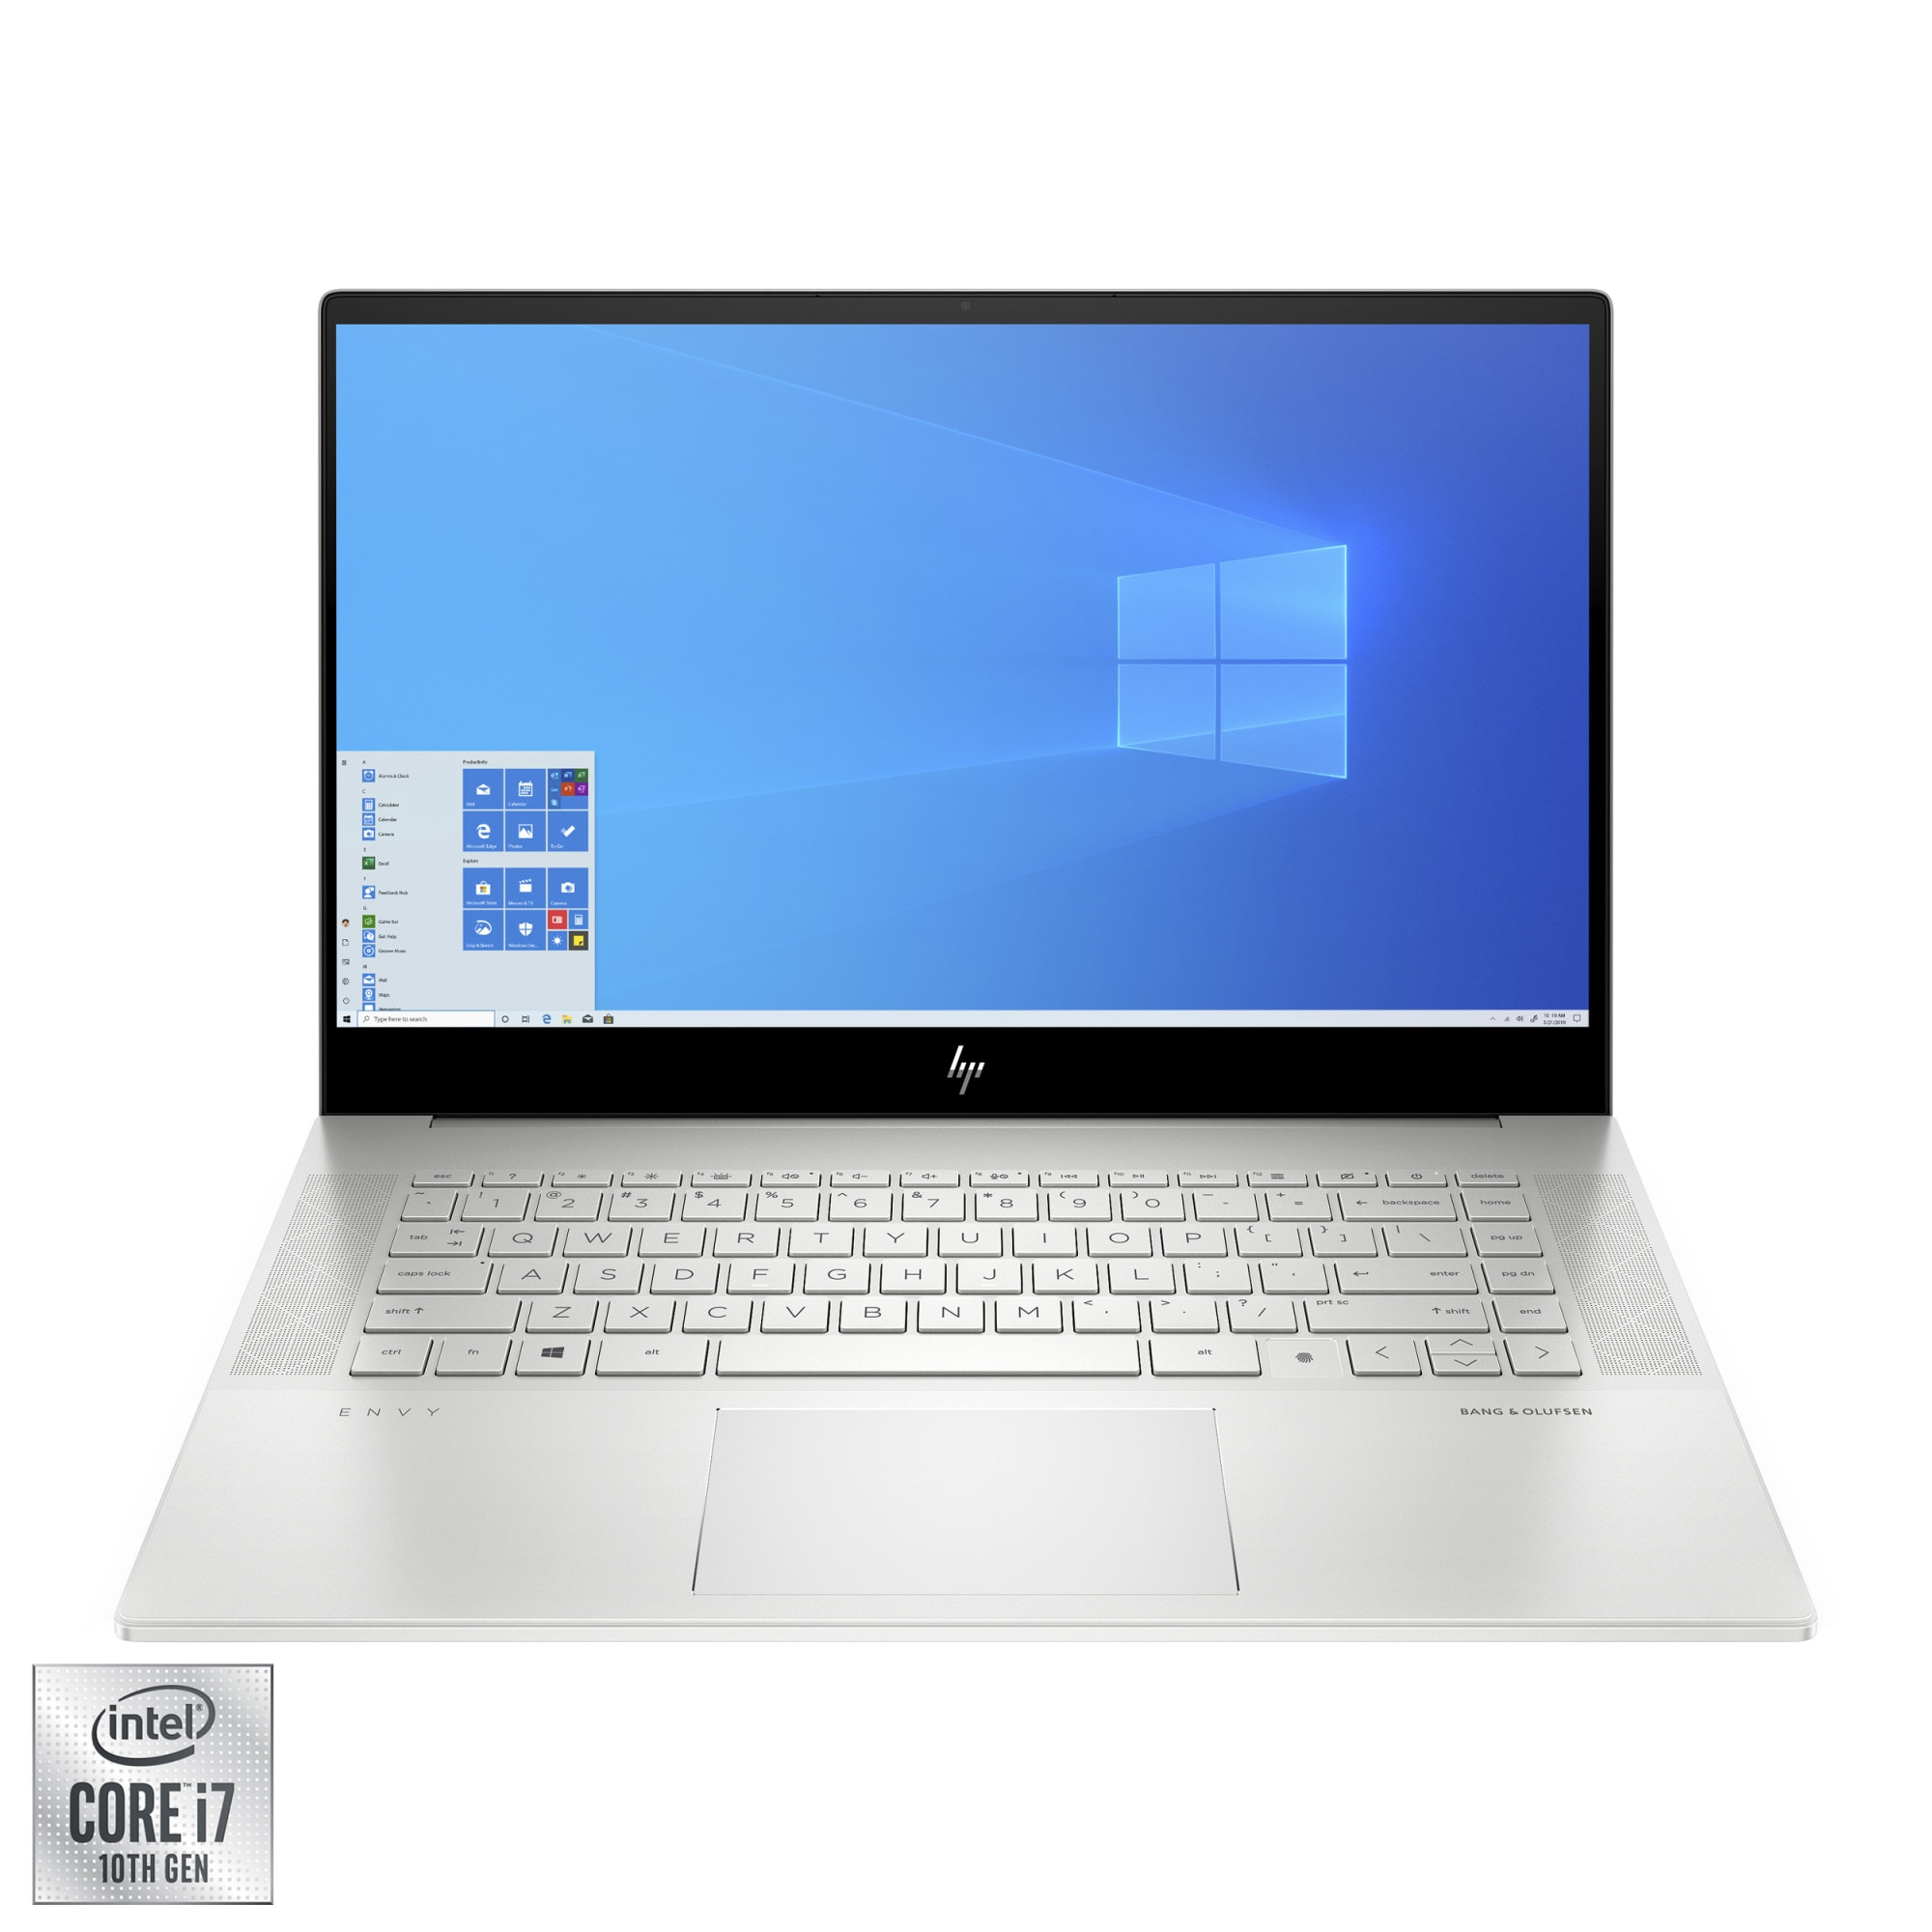 "Fotografie Laptop HP ENVY cu procesor Intel Core i7-10750H pana la 5.00 GHz, 15.6"", Full HD, 16GB, 512GB SSD, NVIDIA GeForce GTX 1660Ti 6GB Max-Q, Windows 10 Pro, Natural Silver"